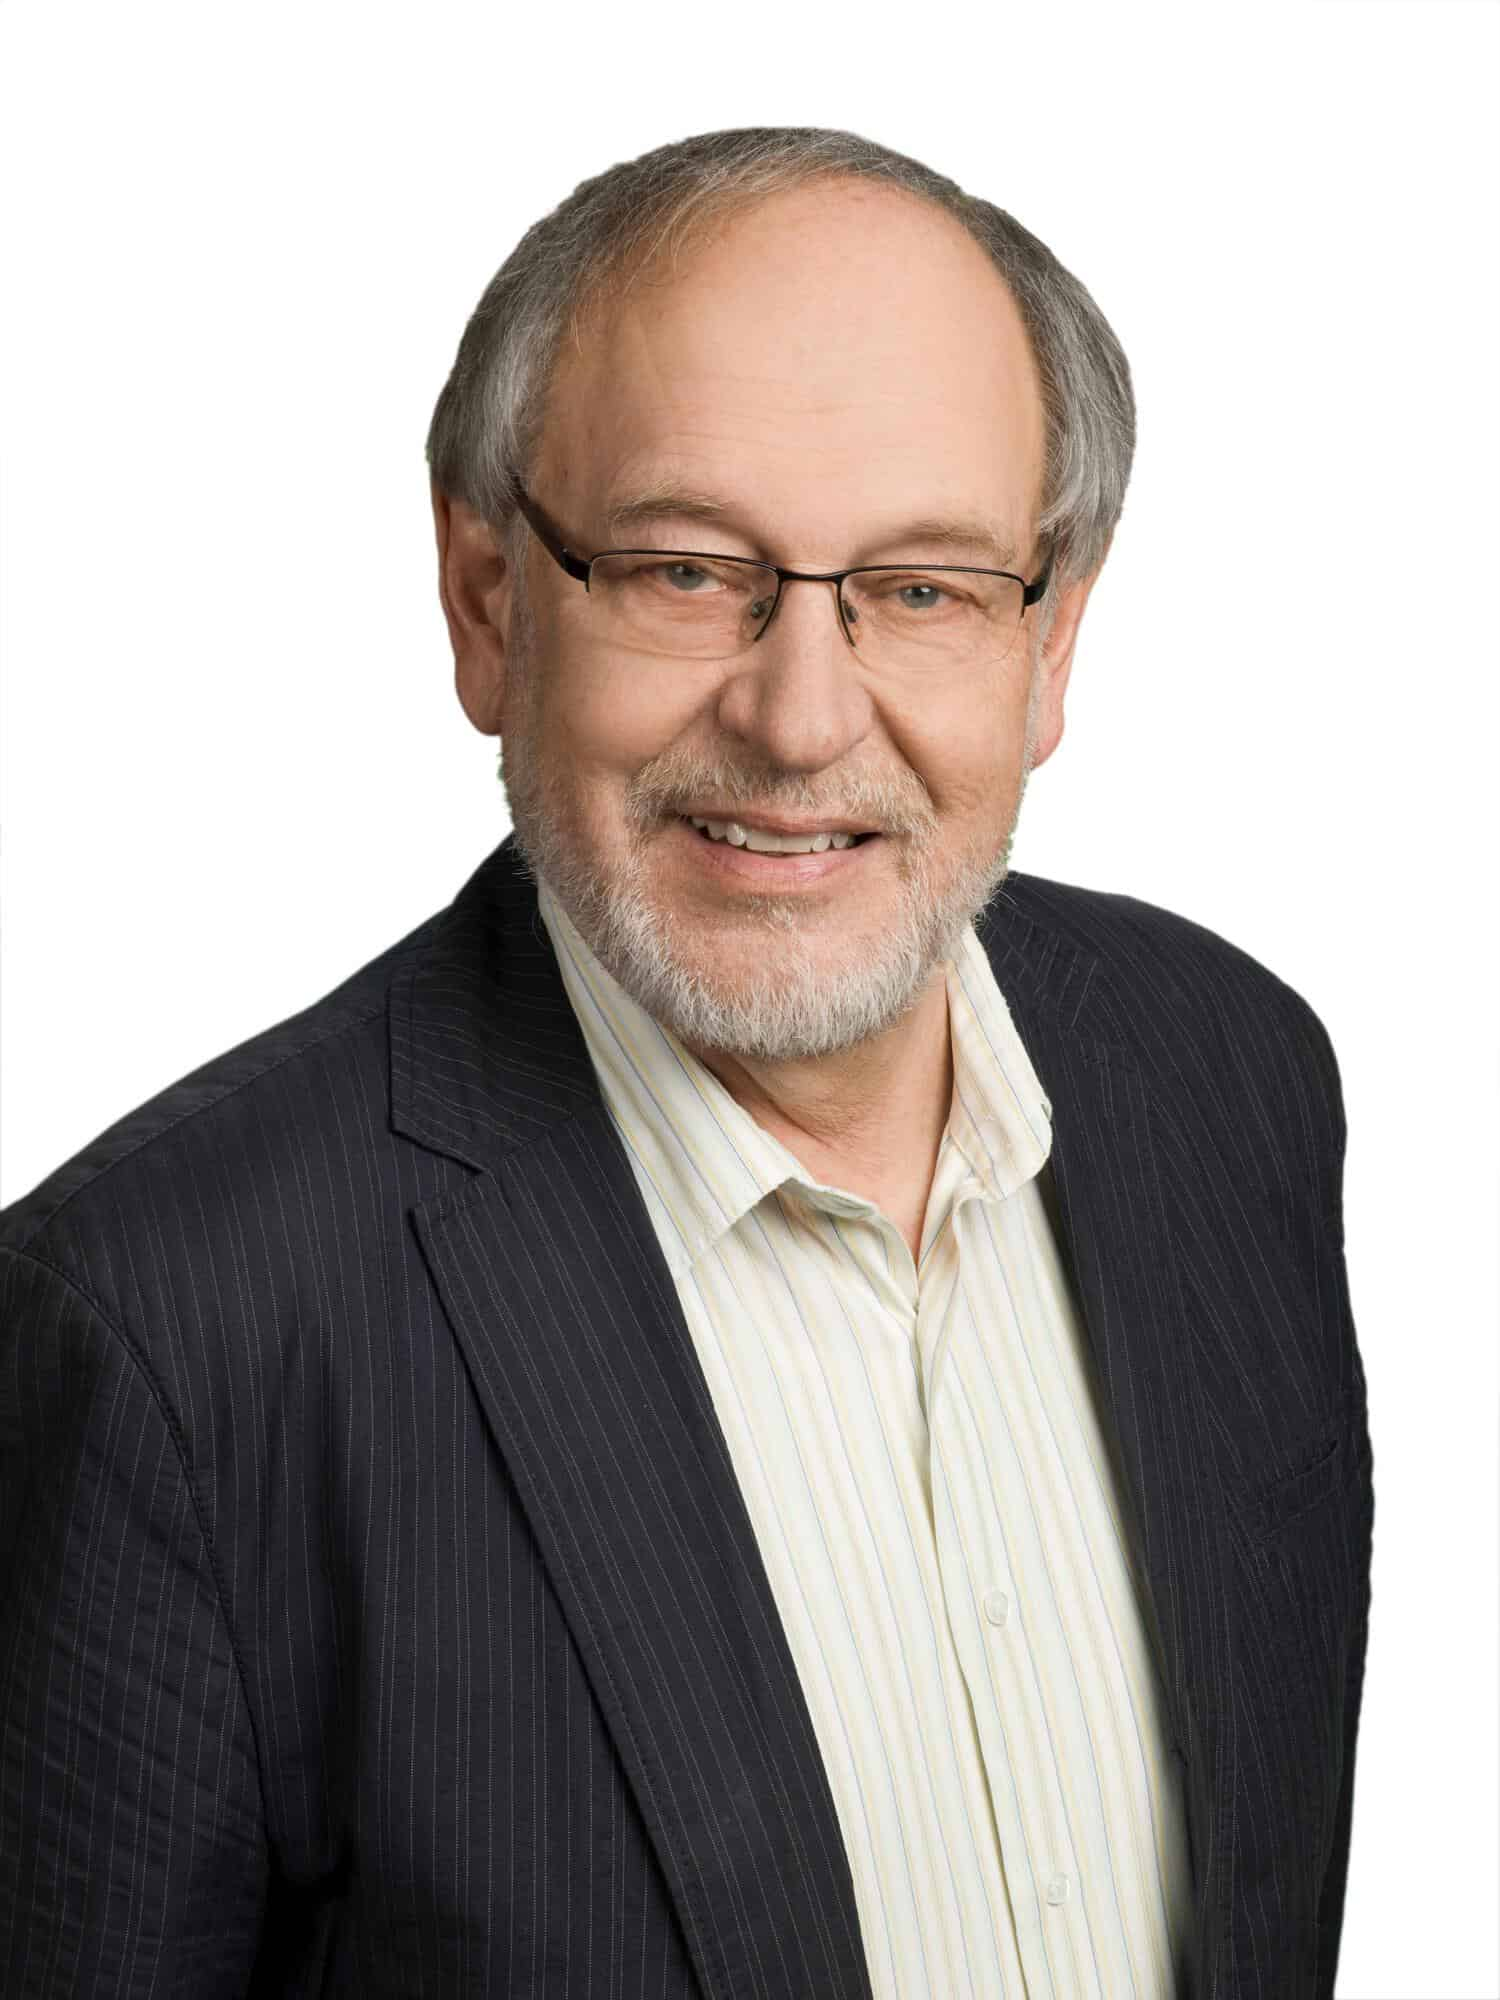 Peter Koschorreck